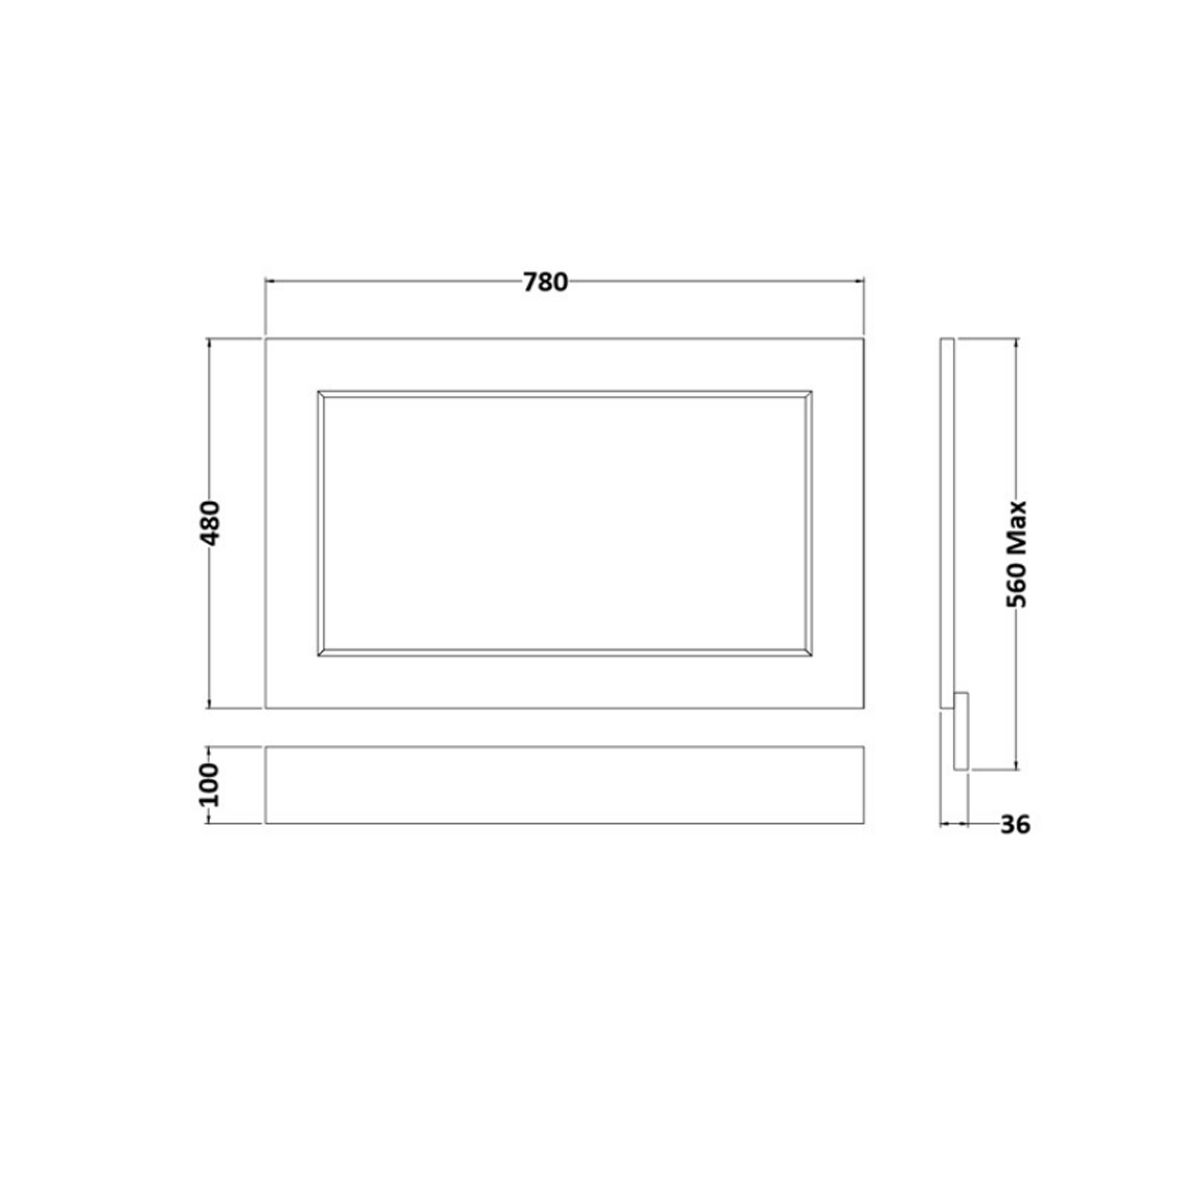 RAK Washington Greige End Bath Panel 800mm Measurements